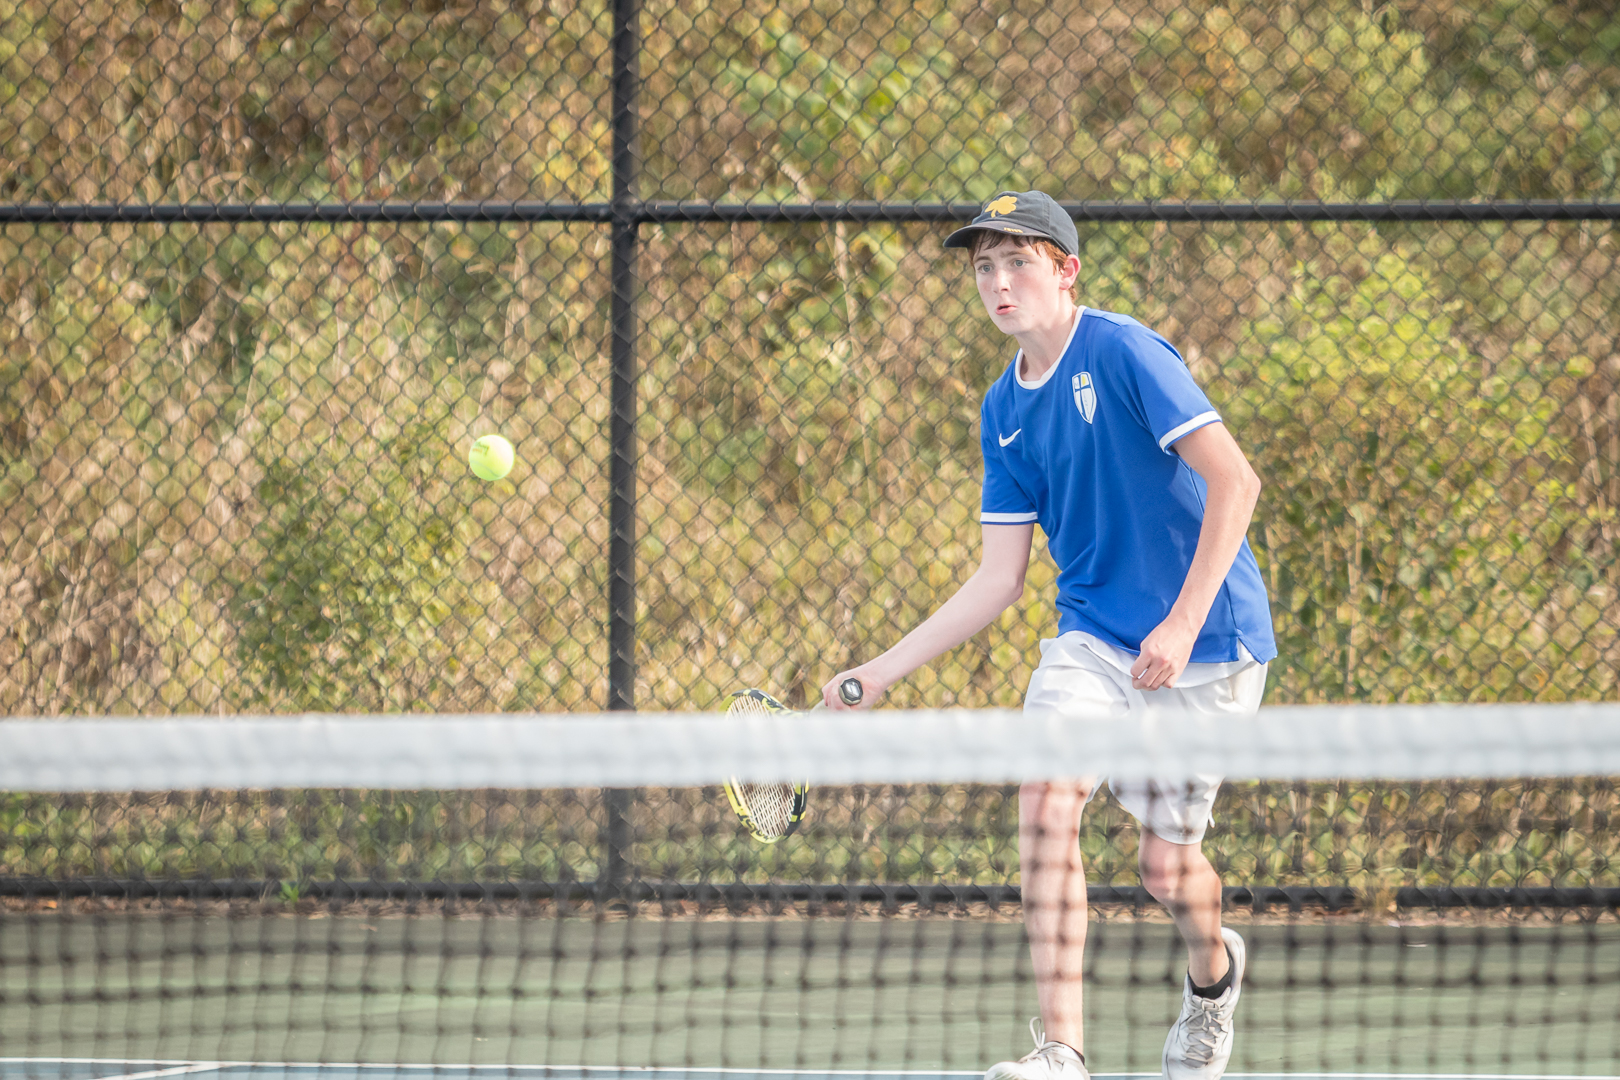 Marian-Boys-Tennis-1715.jpg